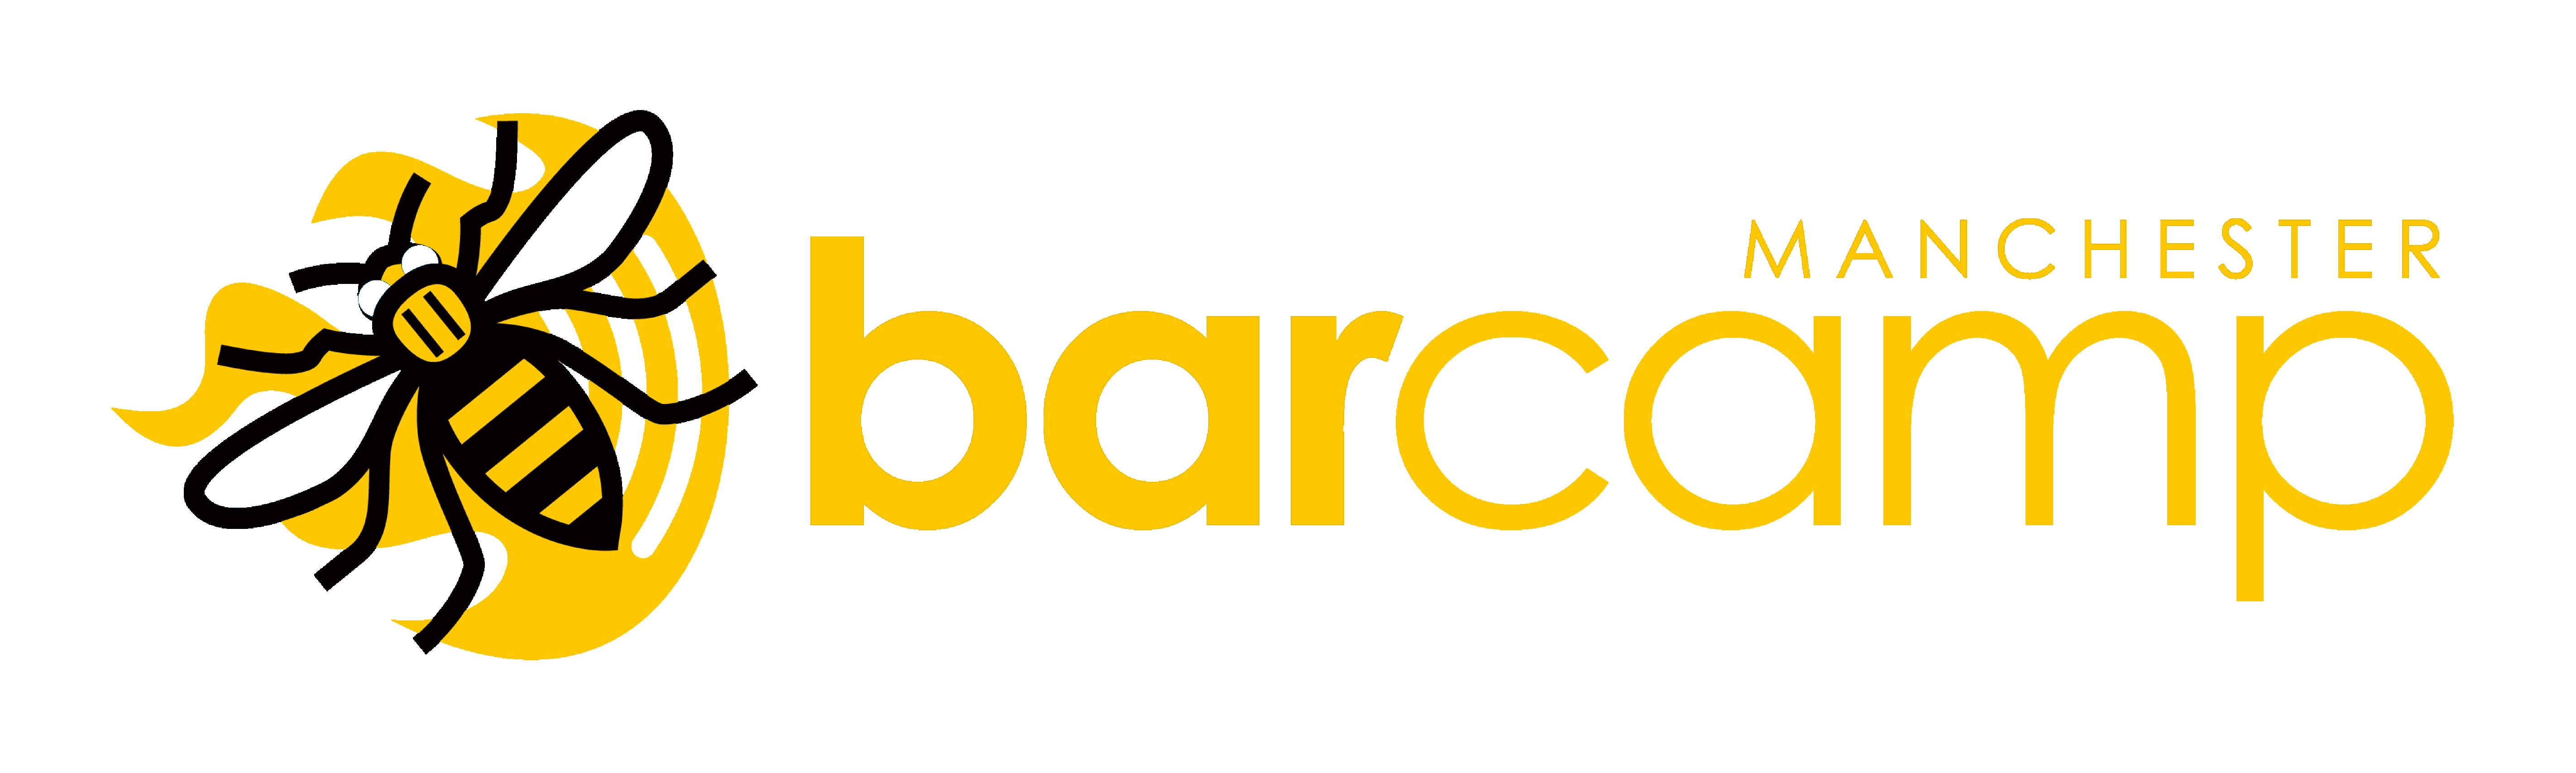 Barcamp Manchester Logo